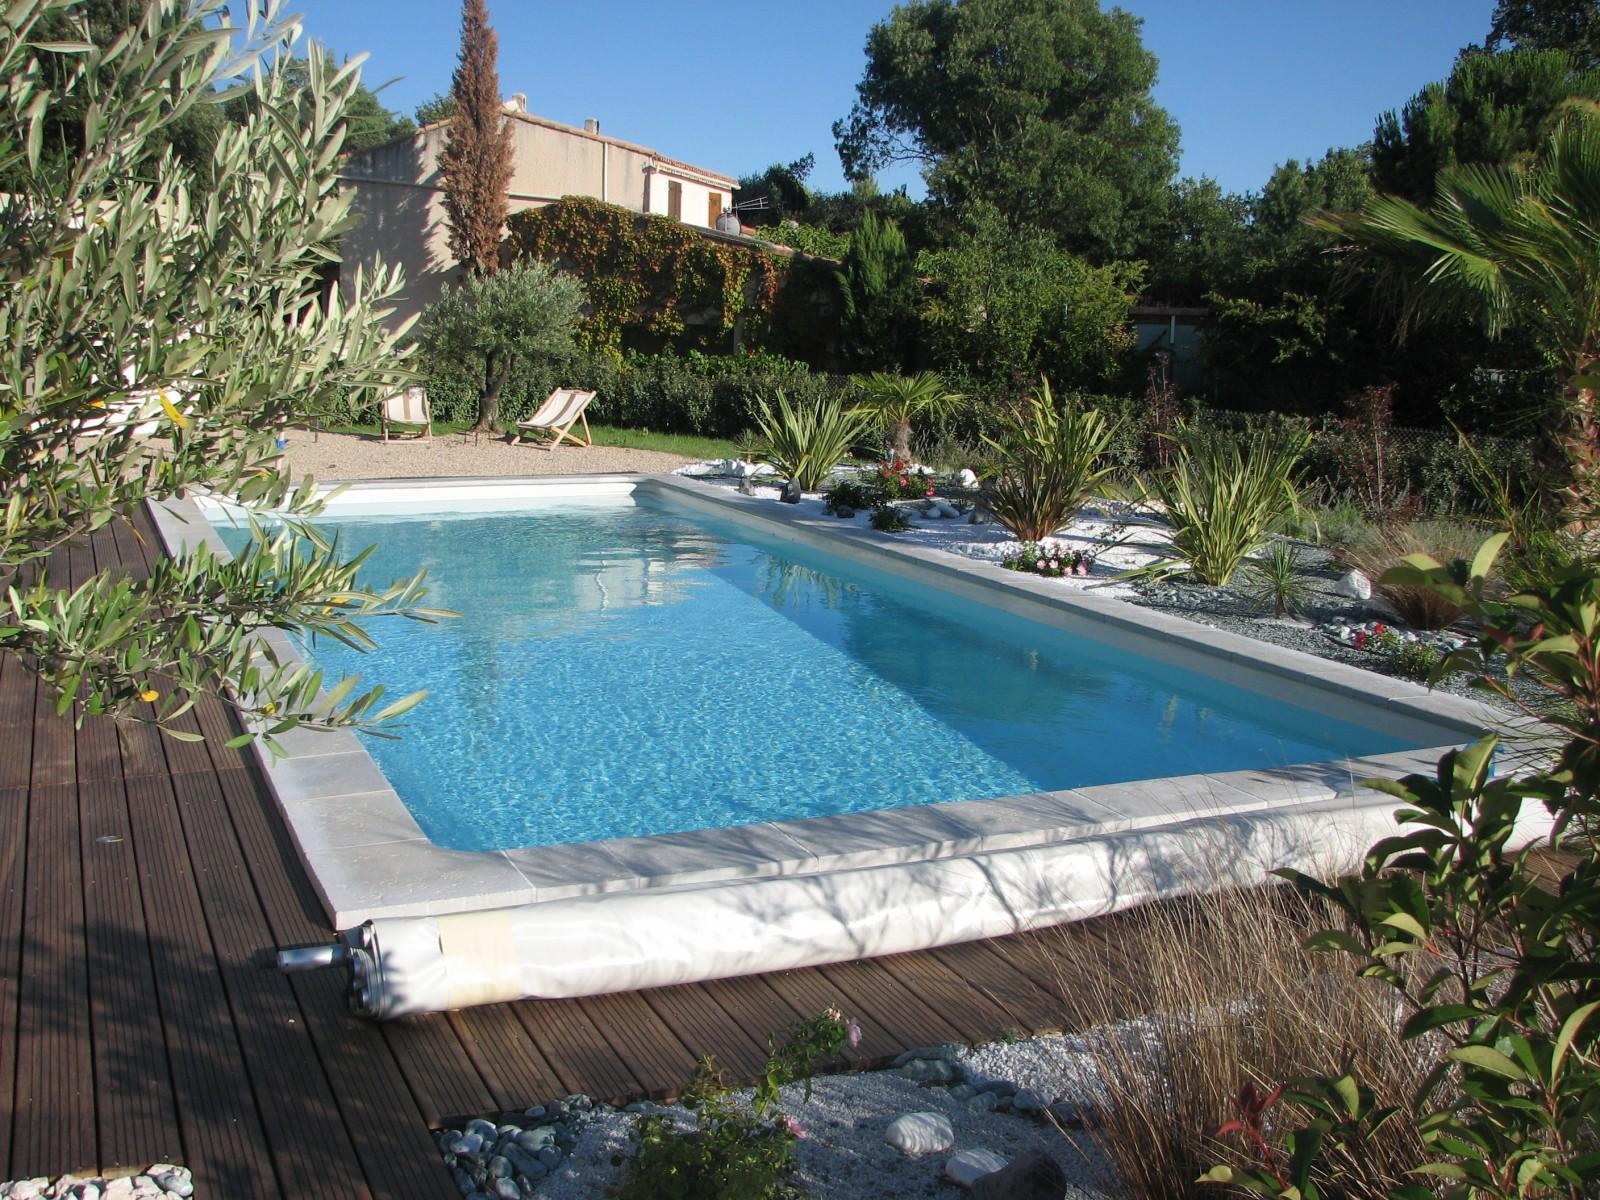 piscine manhattan 7